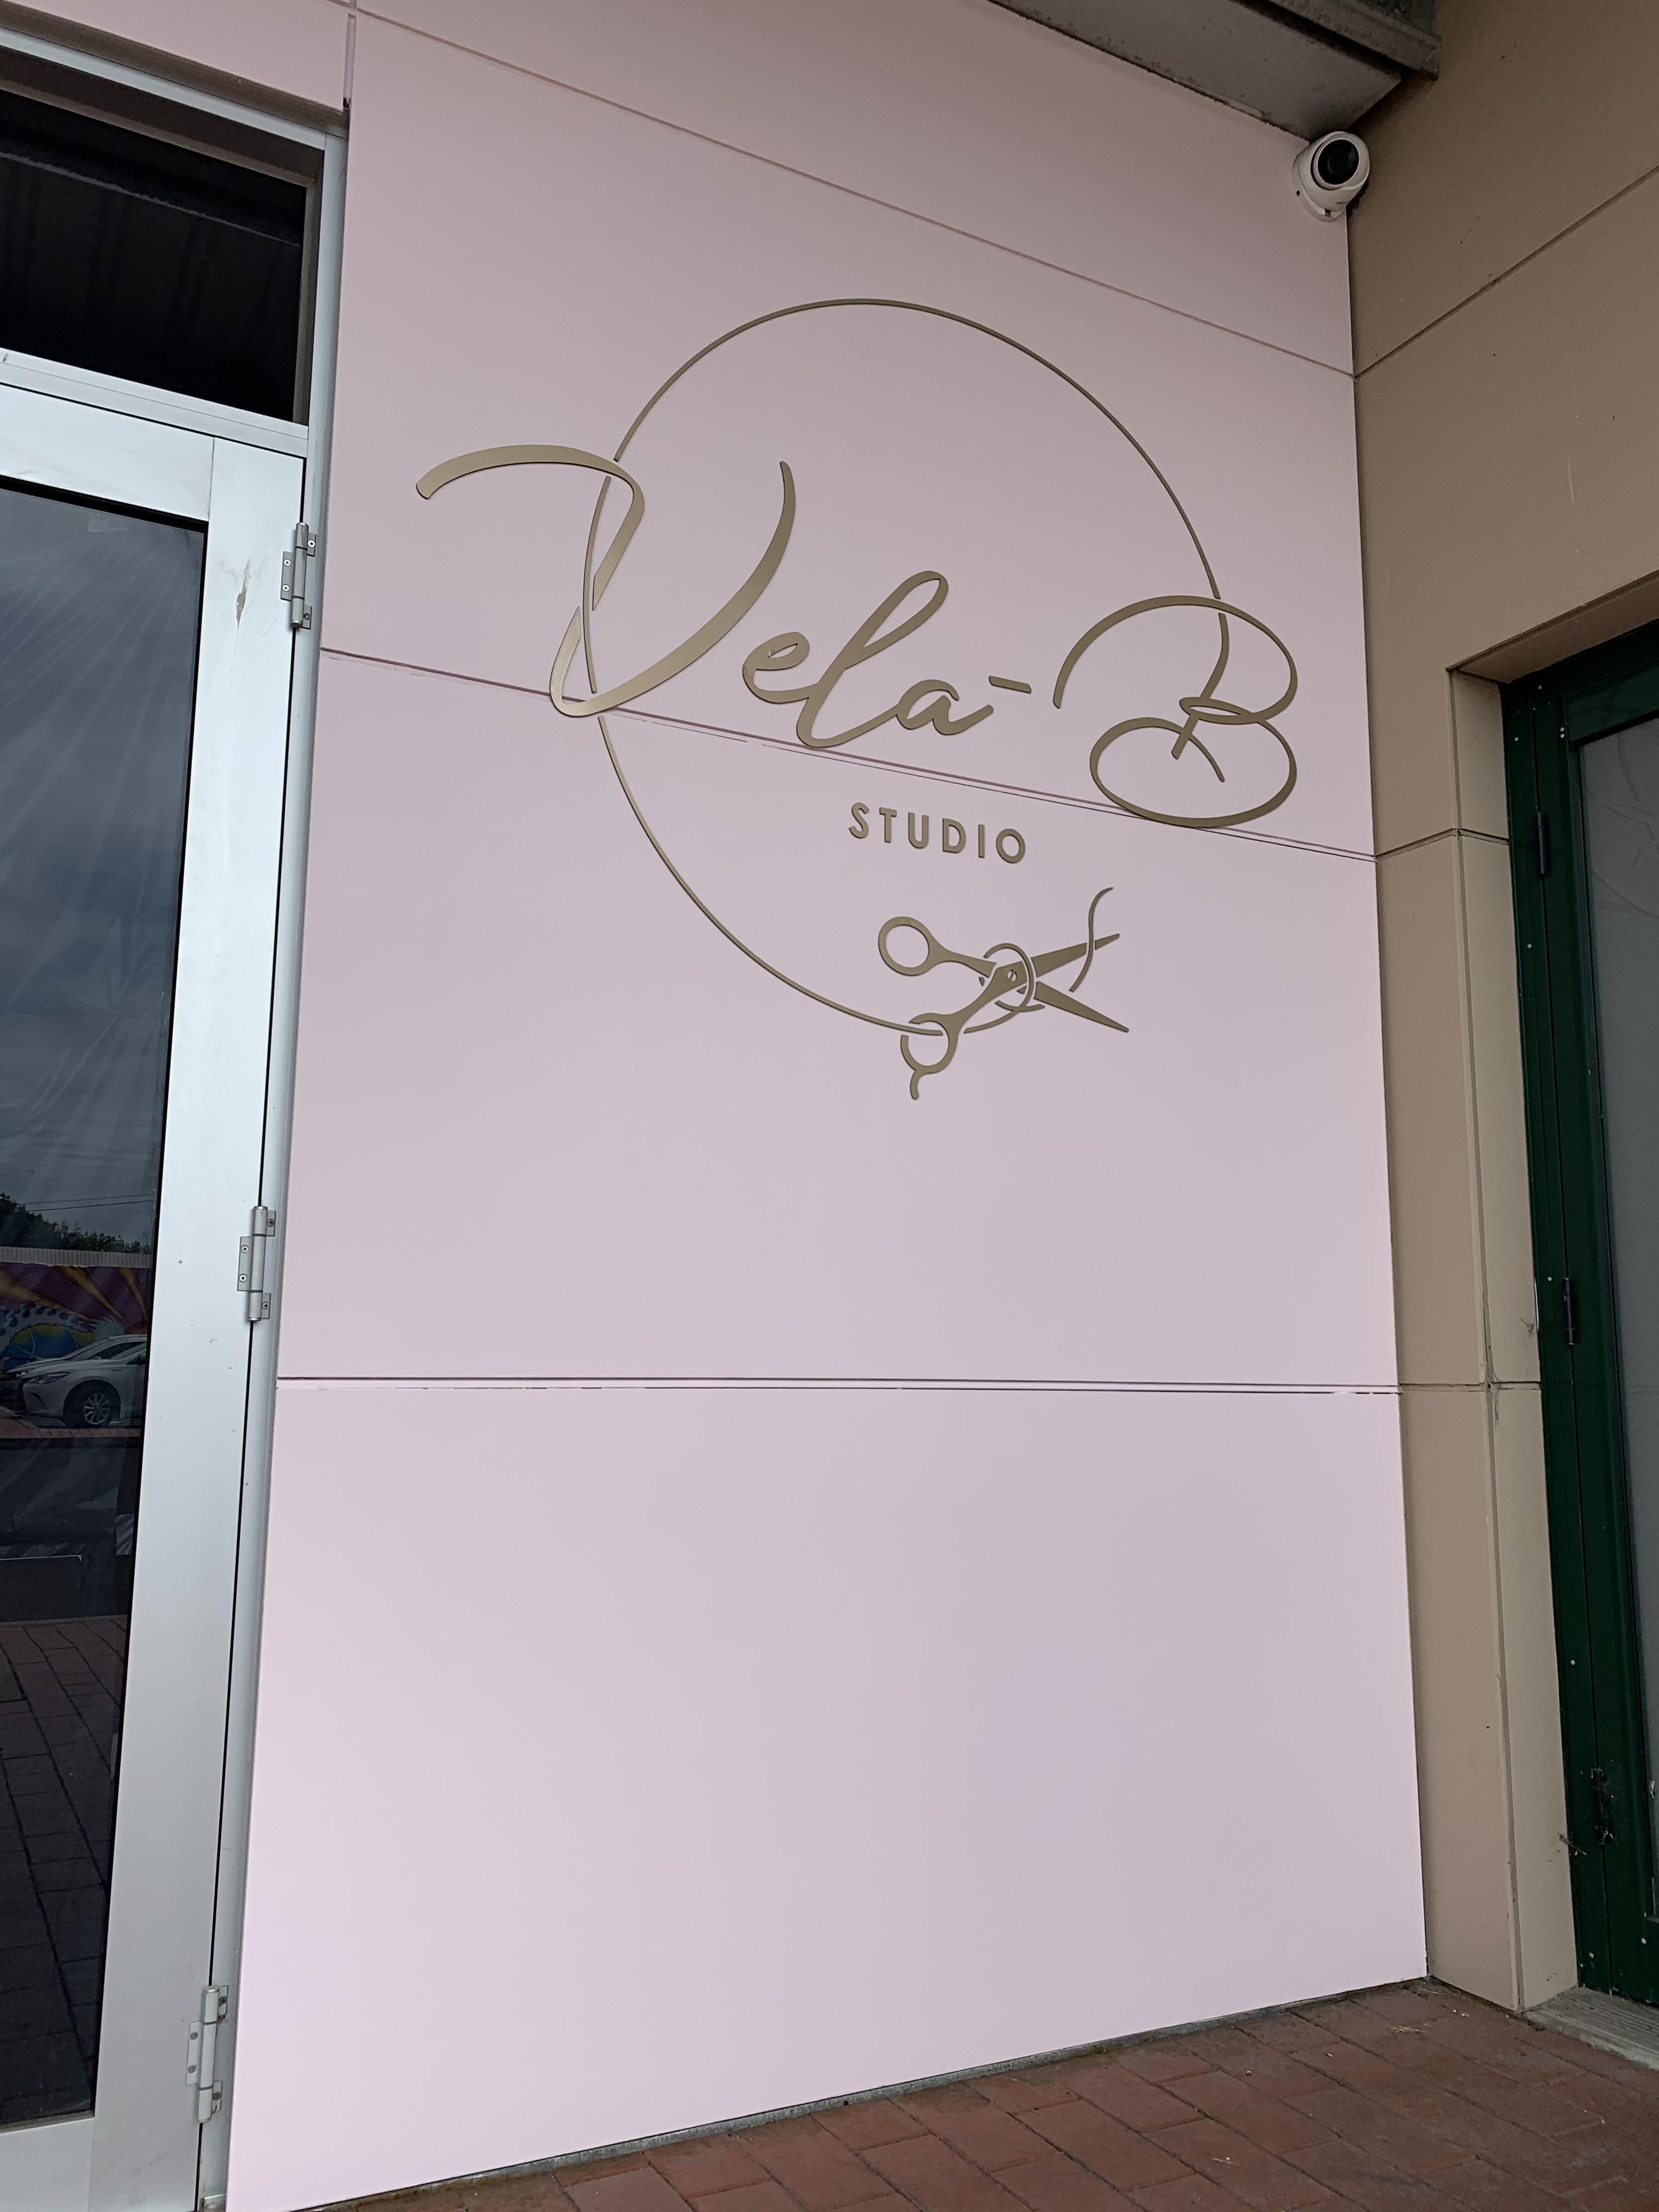 Vela B Hair Studio Signage